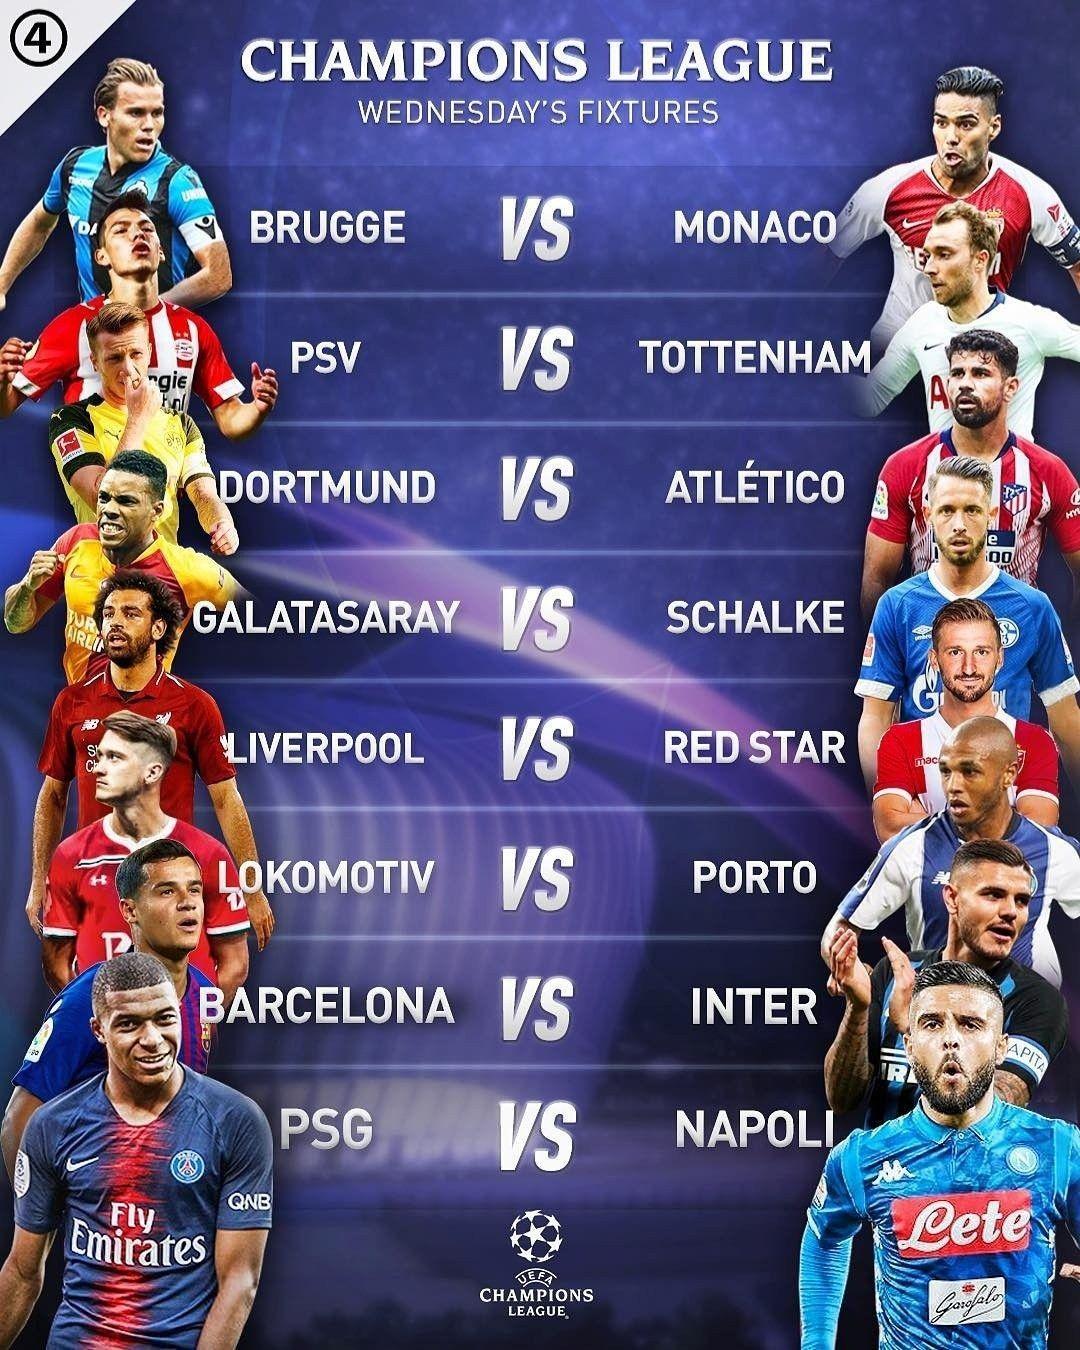 uefa champions league wednesday s fixtures best of uefa european championship champions league uefa european championship uefa champions league www pinterest jp